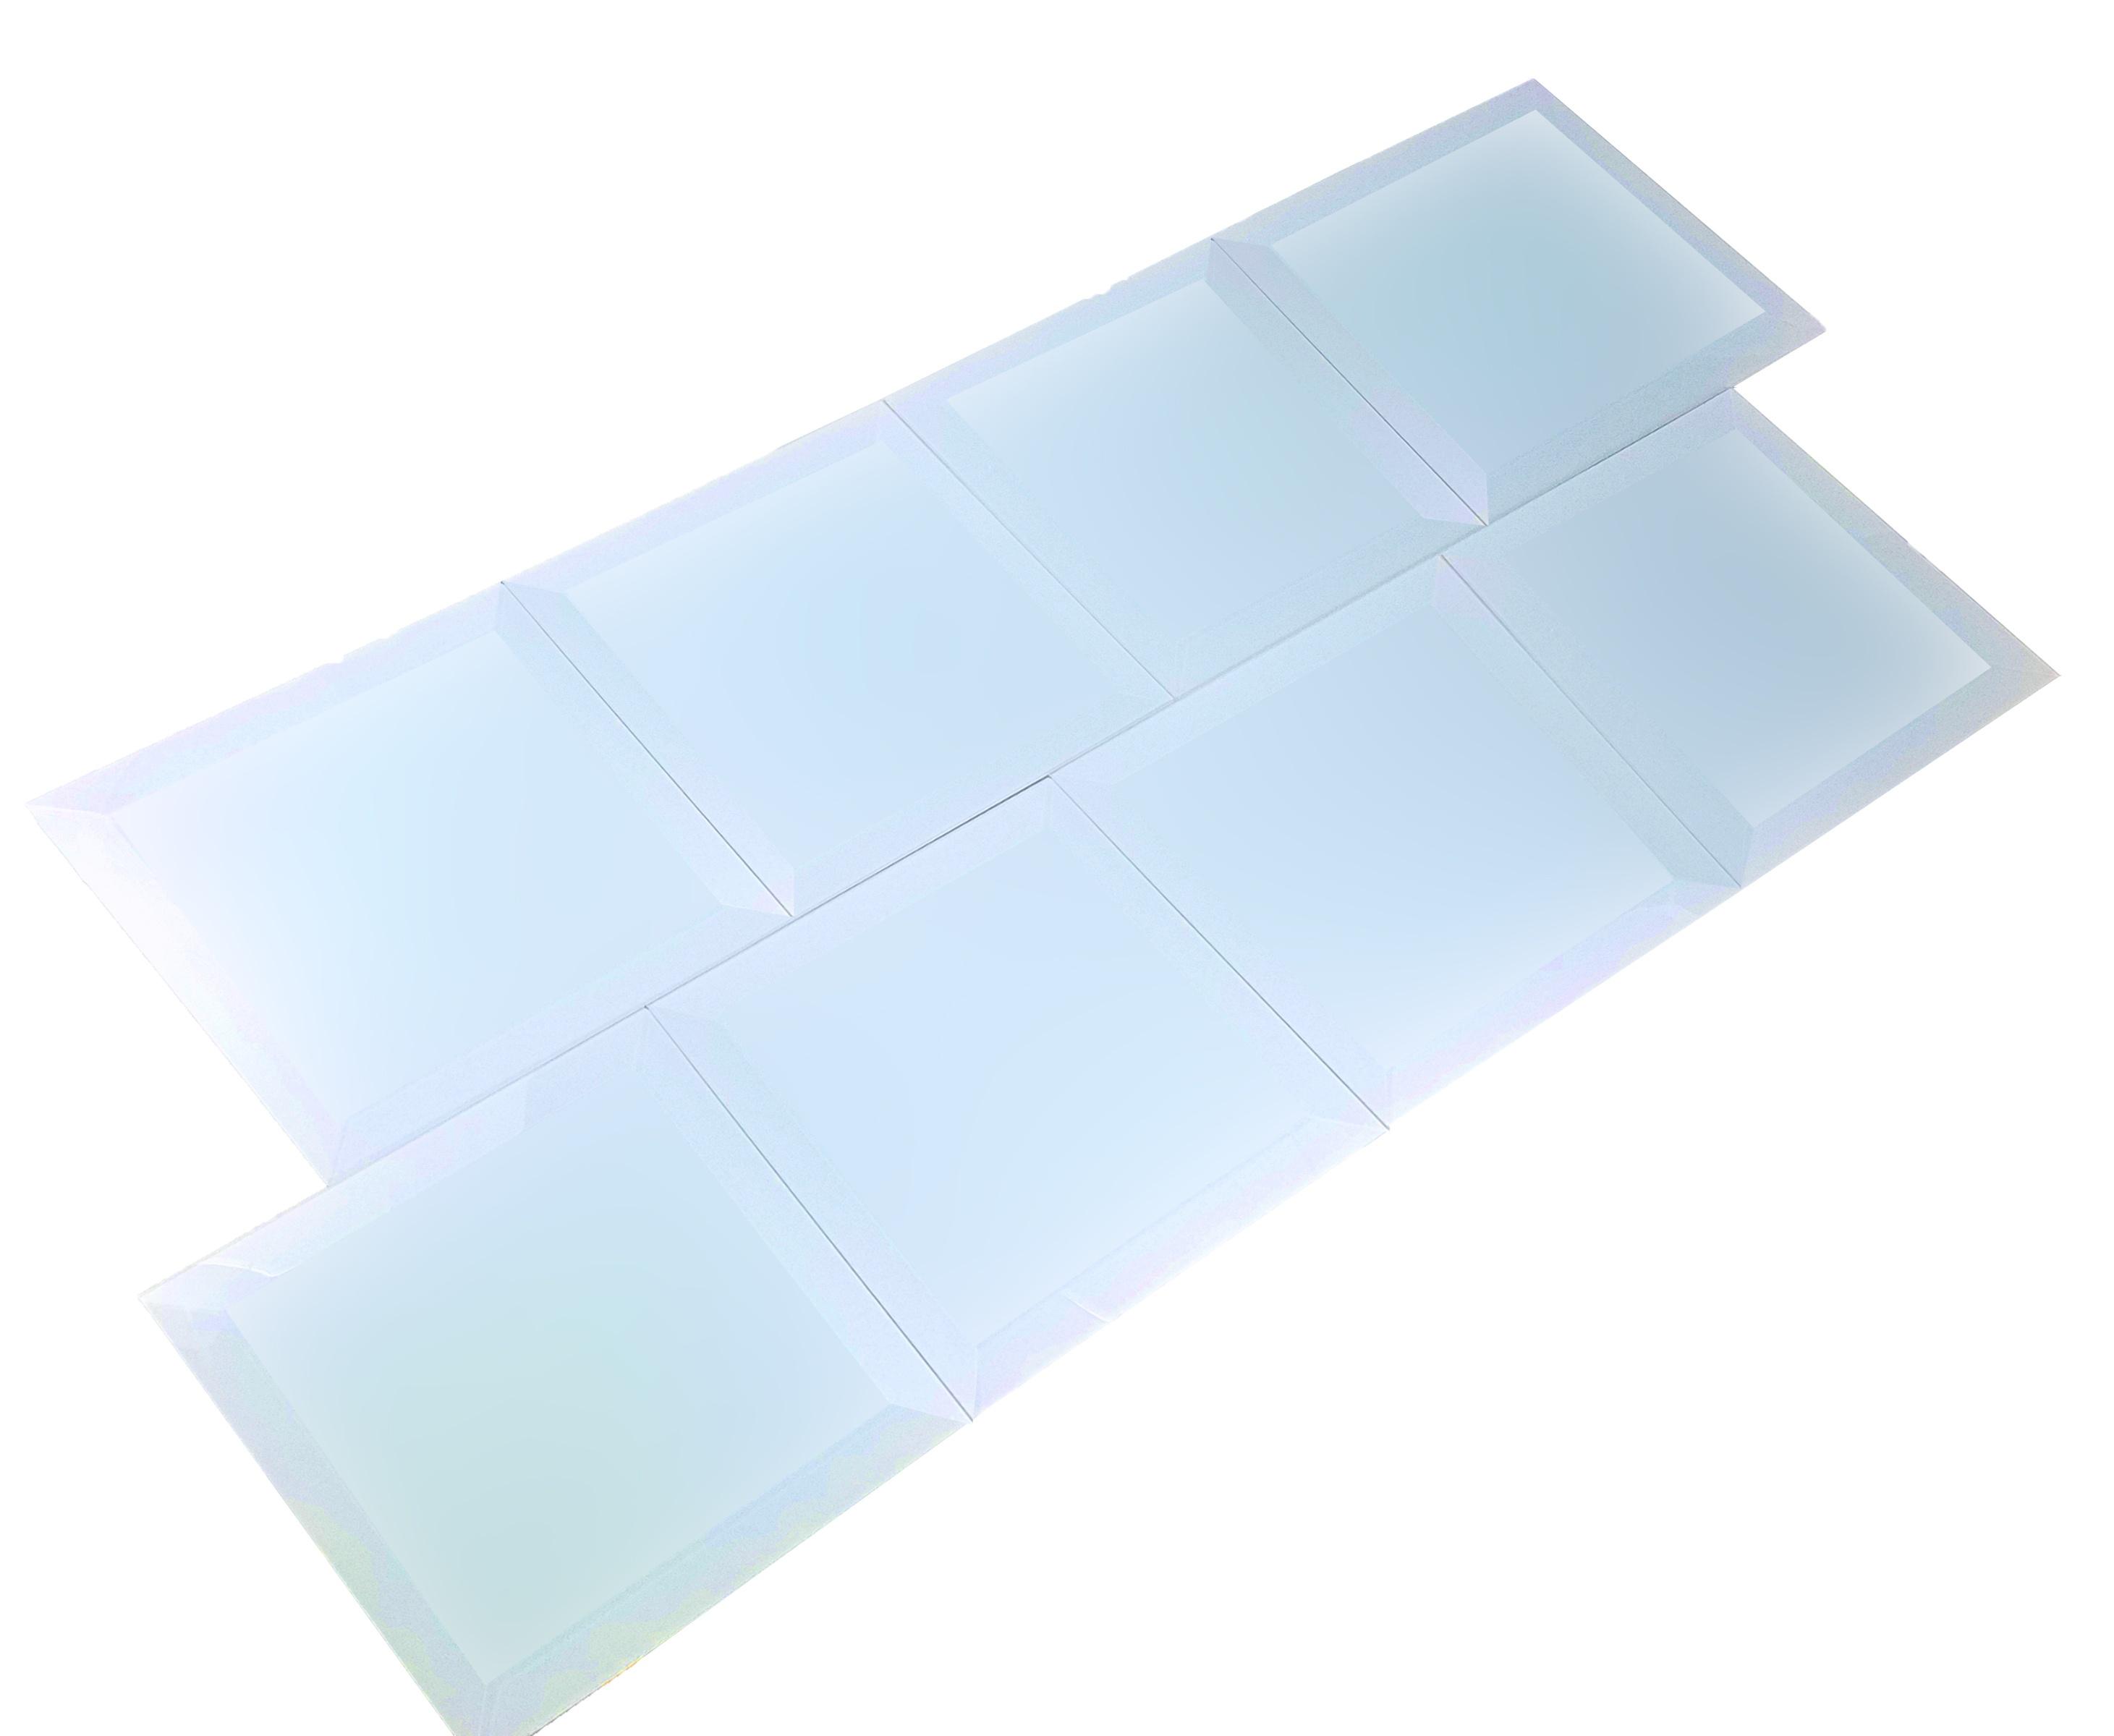 "Frosted Elegance 8"" x 8"" Matte Blue Glass Field Backsplash Wall Tile"